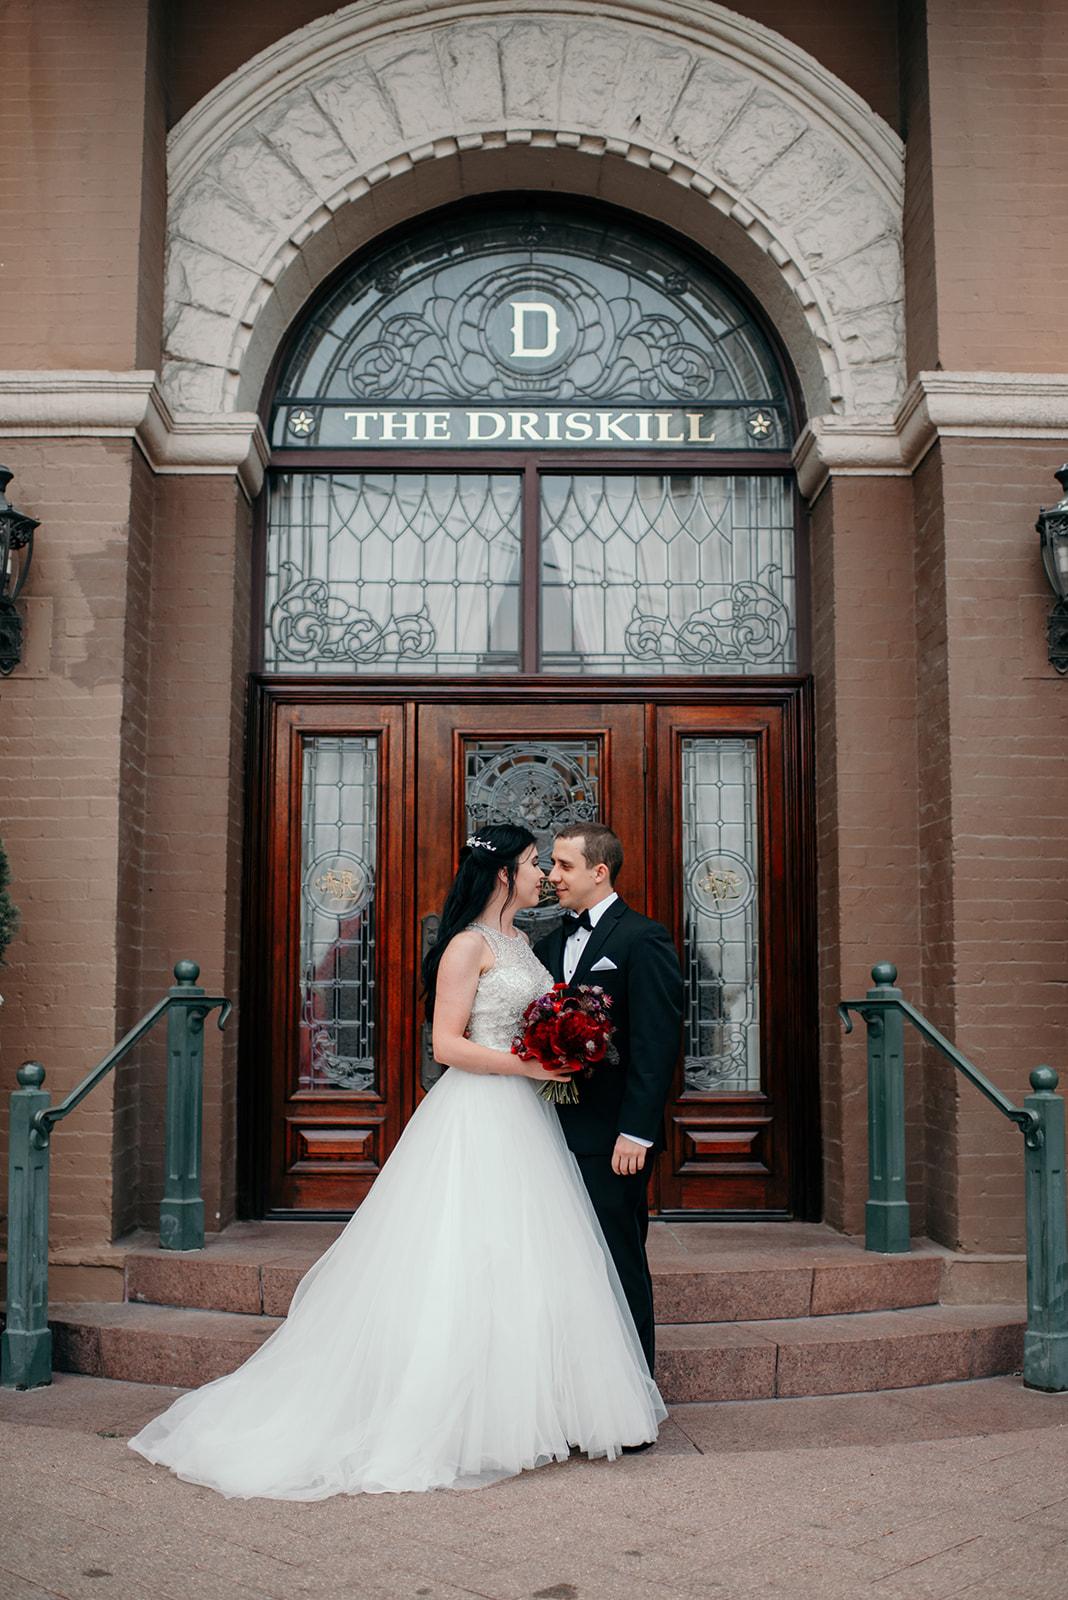 driskill-hotel-austin-wedding-flowers.jpg